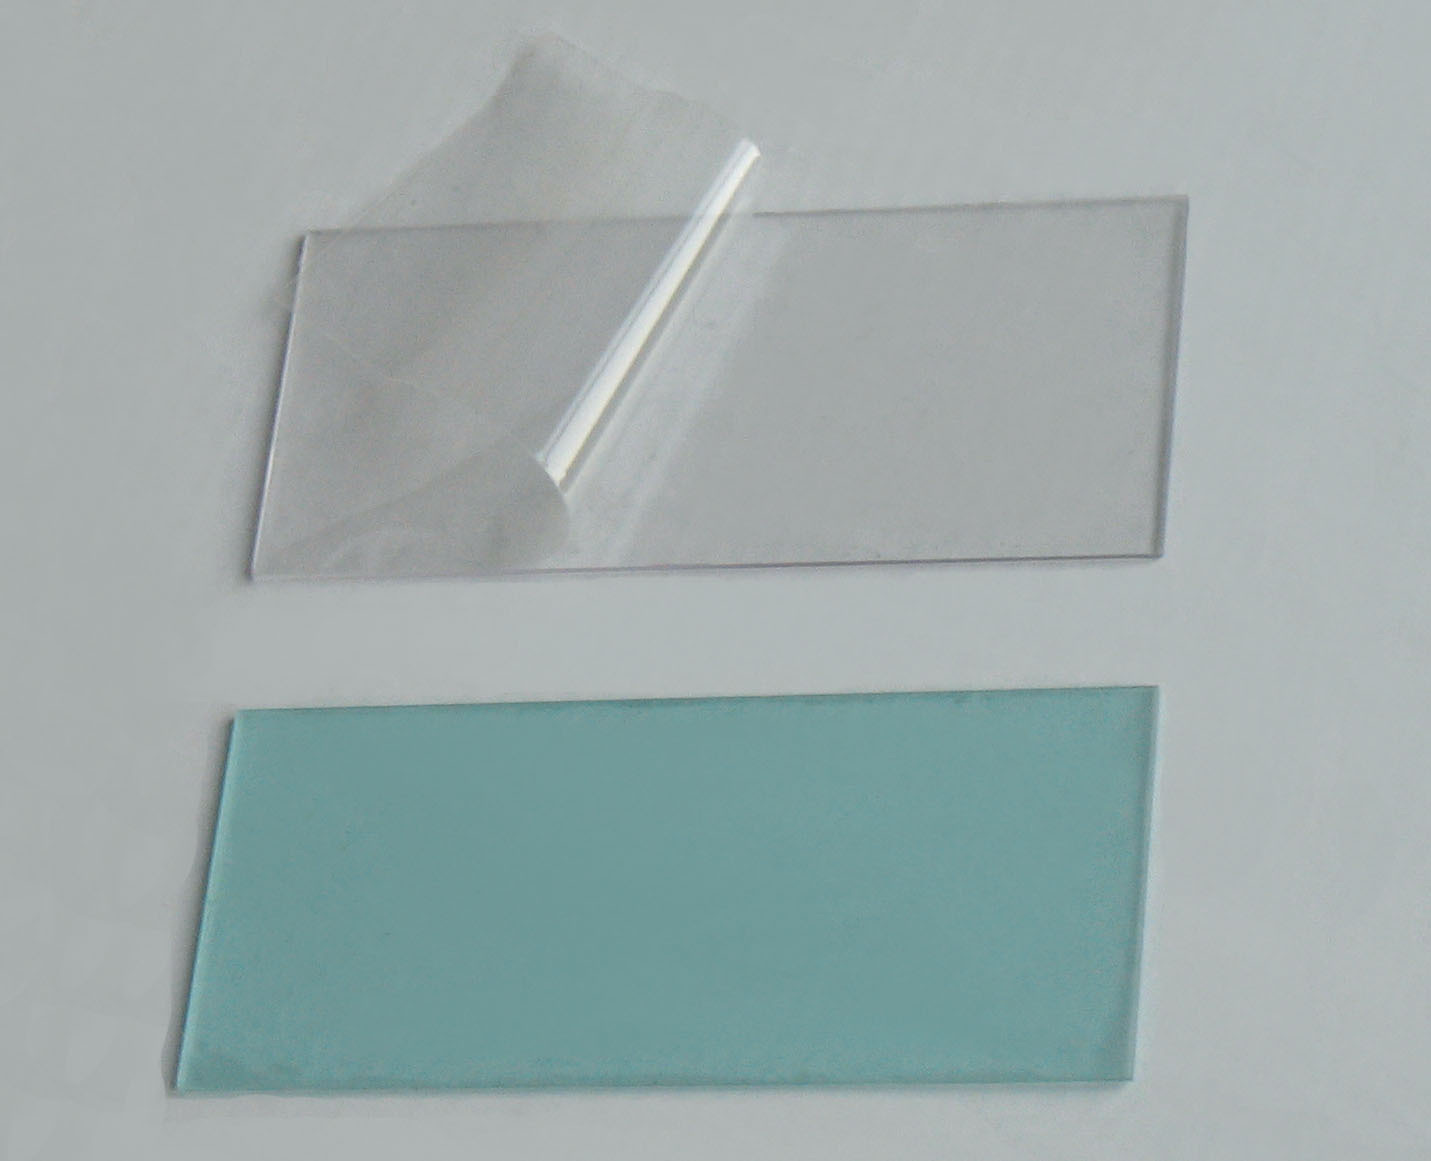 PC内保护片-迅达牌自动变光焊帽挡焊渣耗材(变光镜片内)